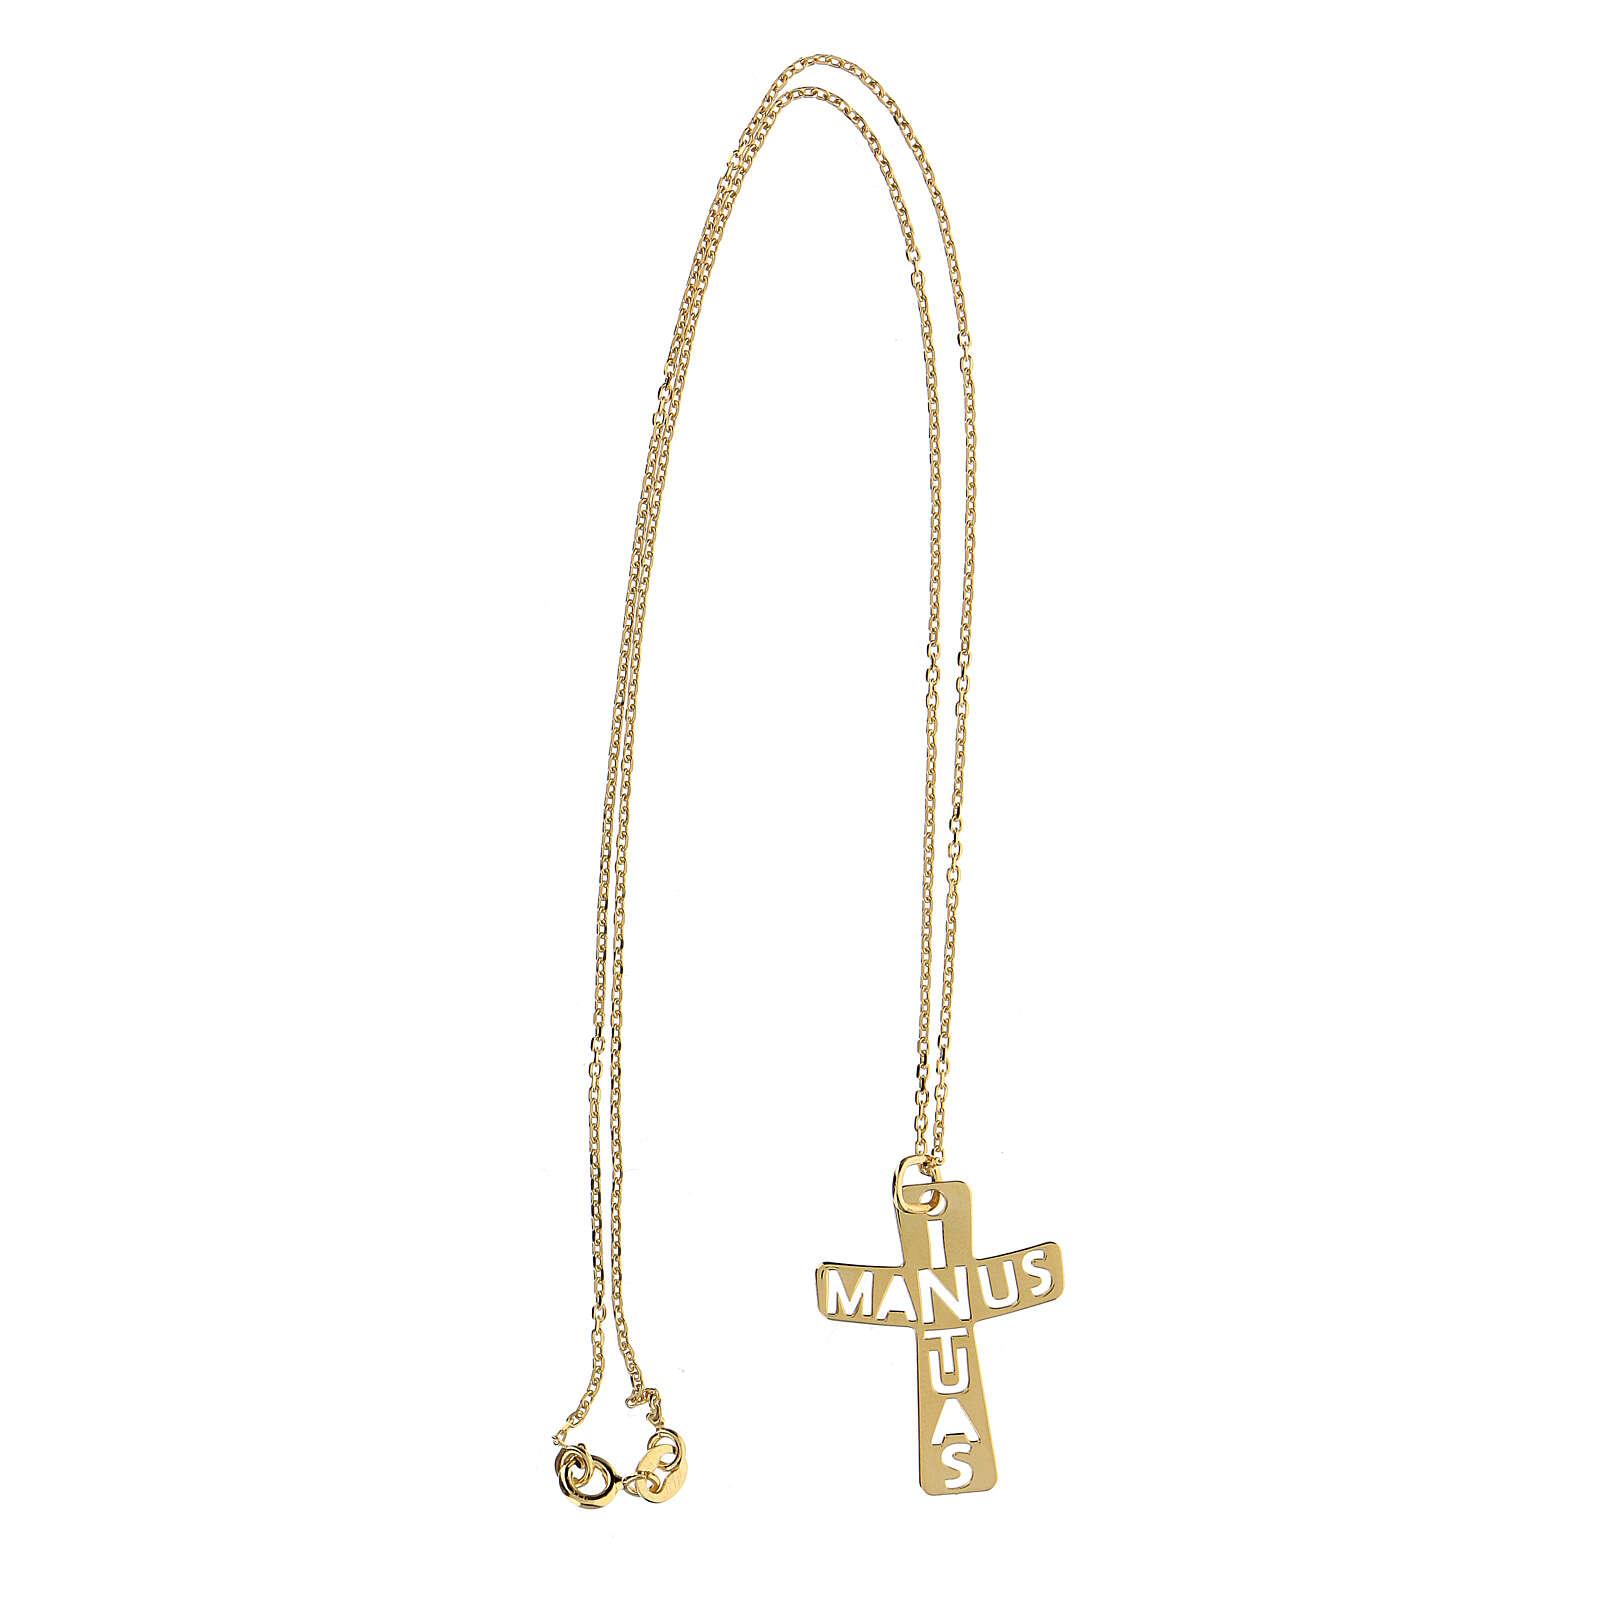 Pendentif grande croix ajourée argent 925 doré In Manus Tuas 4